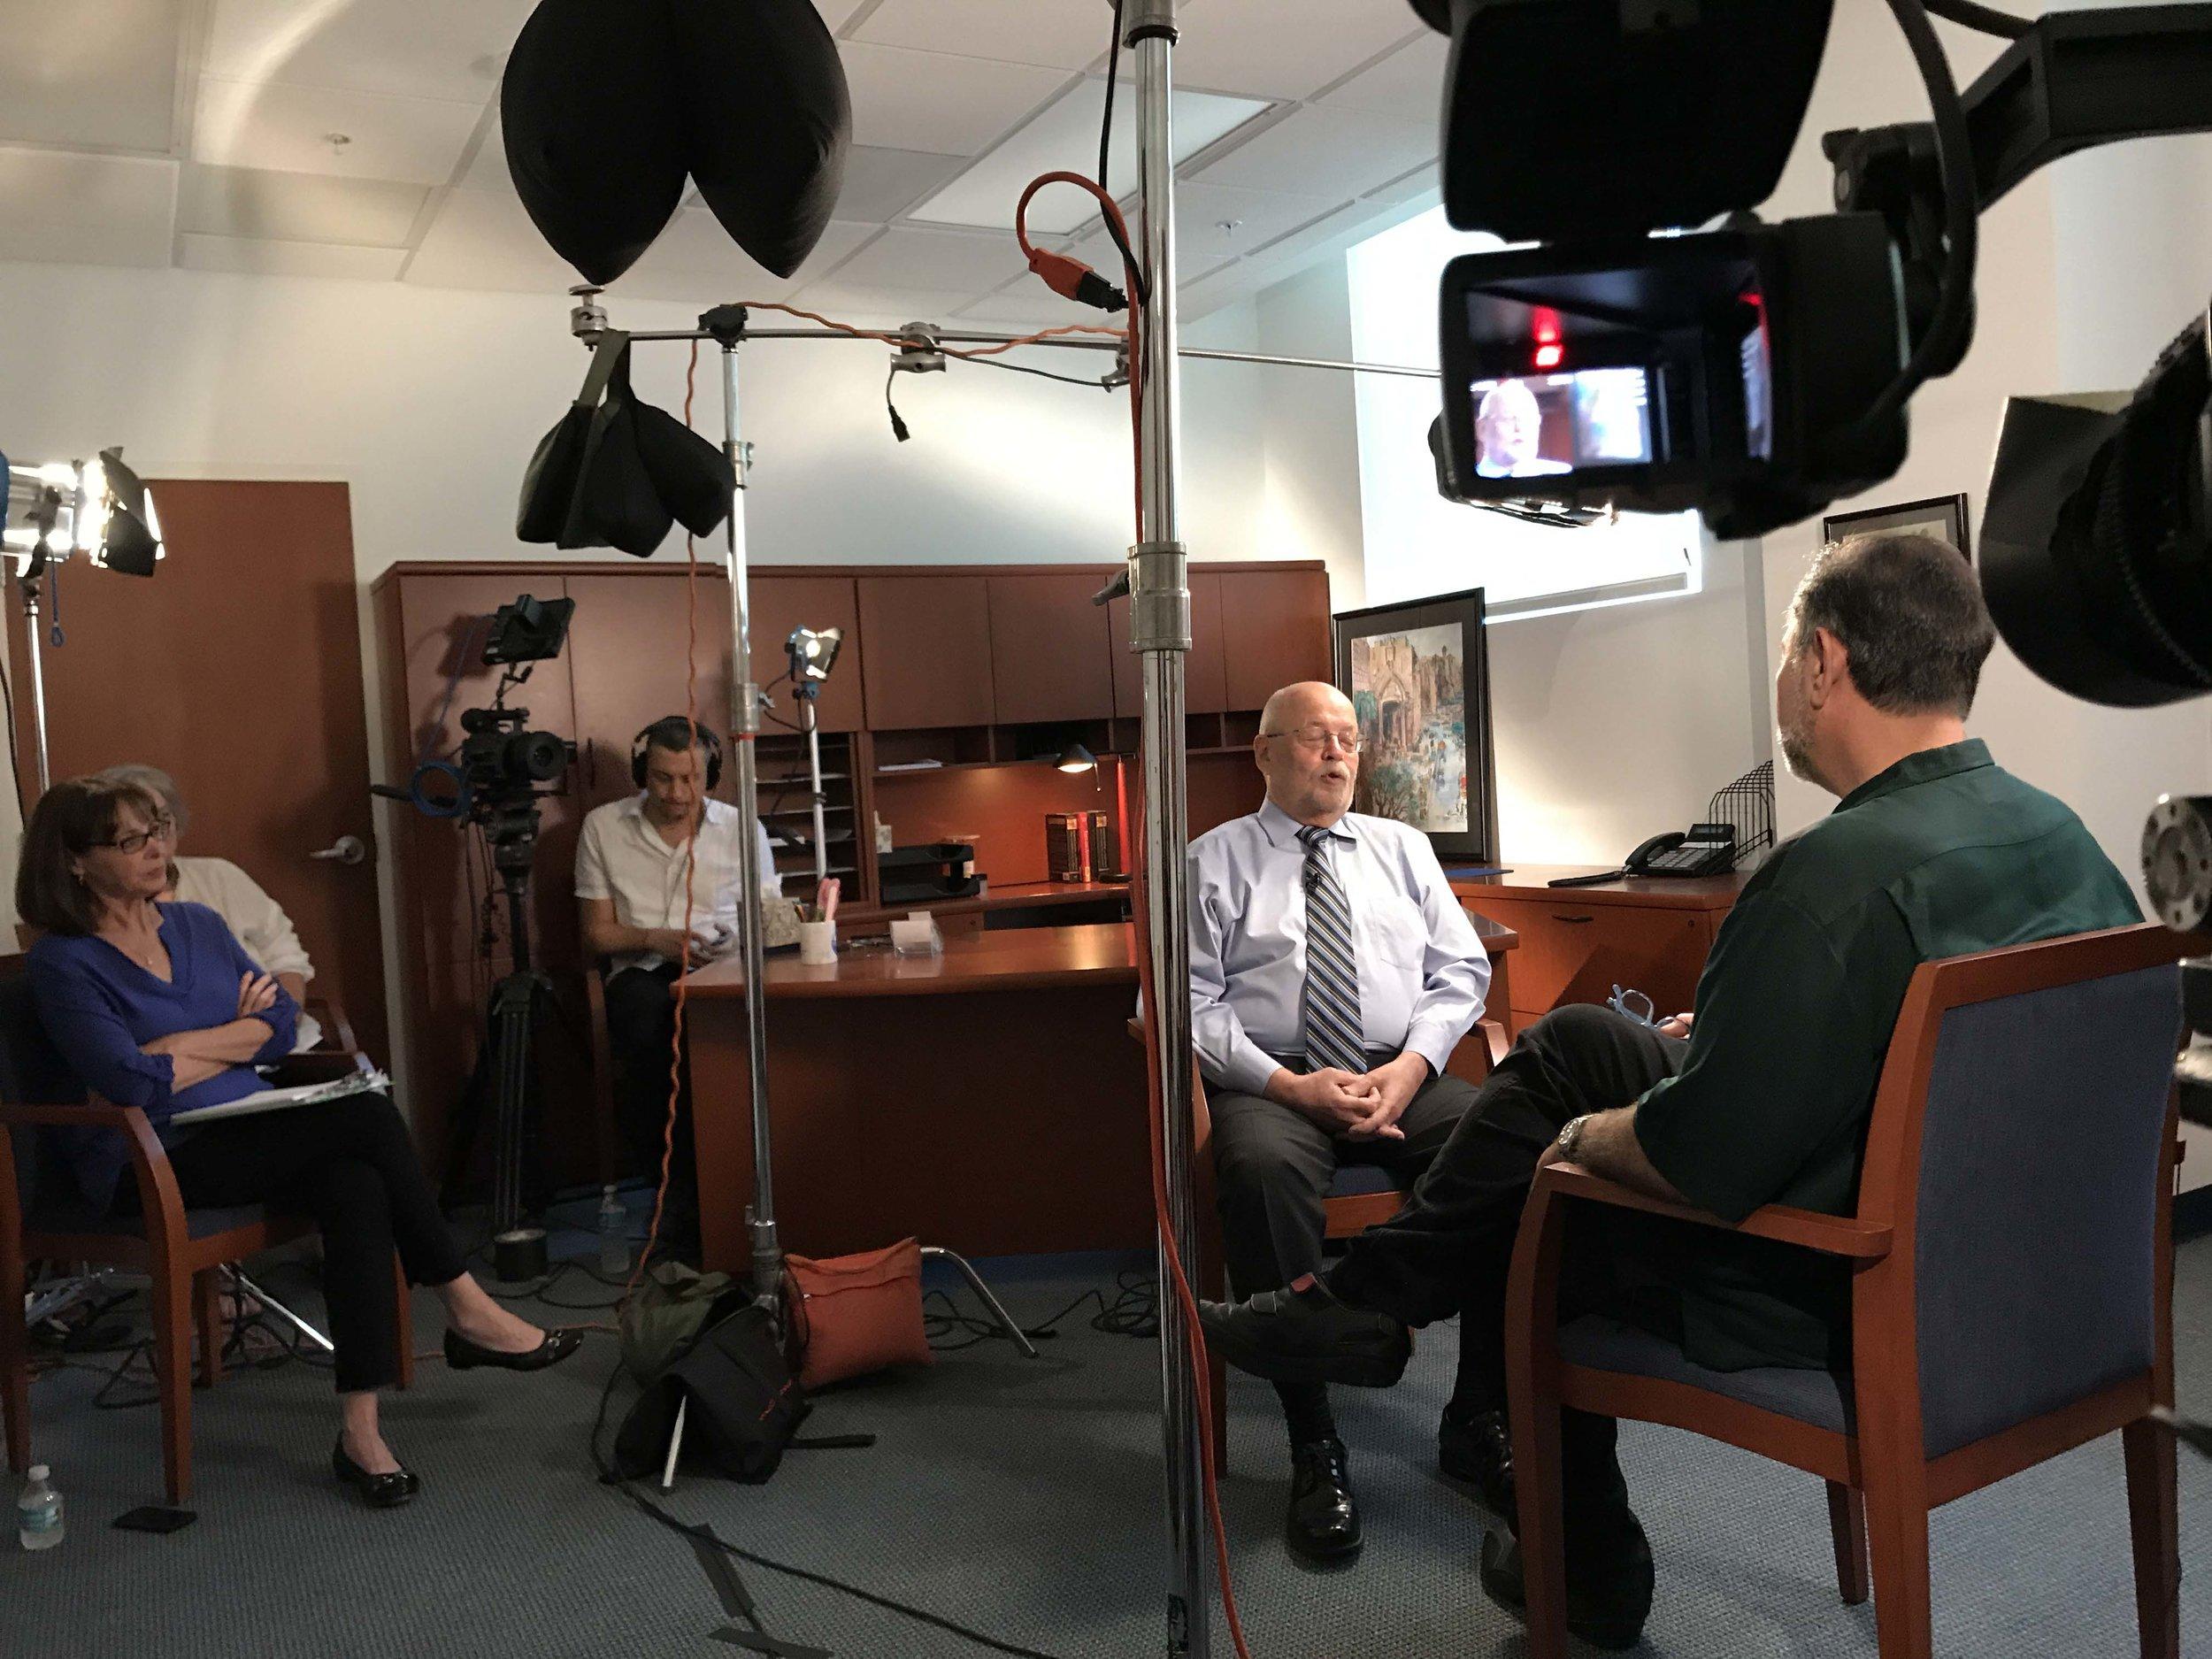 Senior Executive Producer Mindy Hersh, Camera Operator Michael Behar, Professor Haim Shaked.